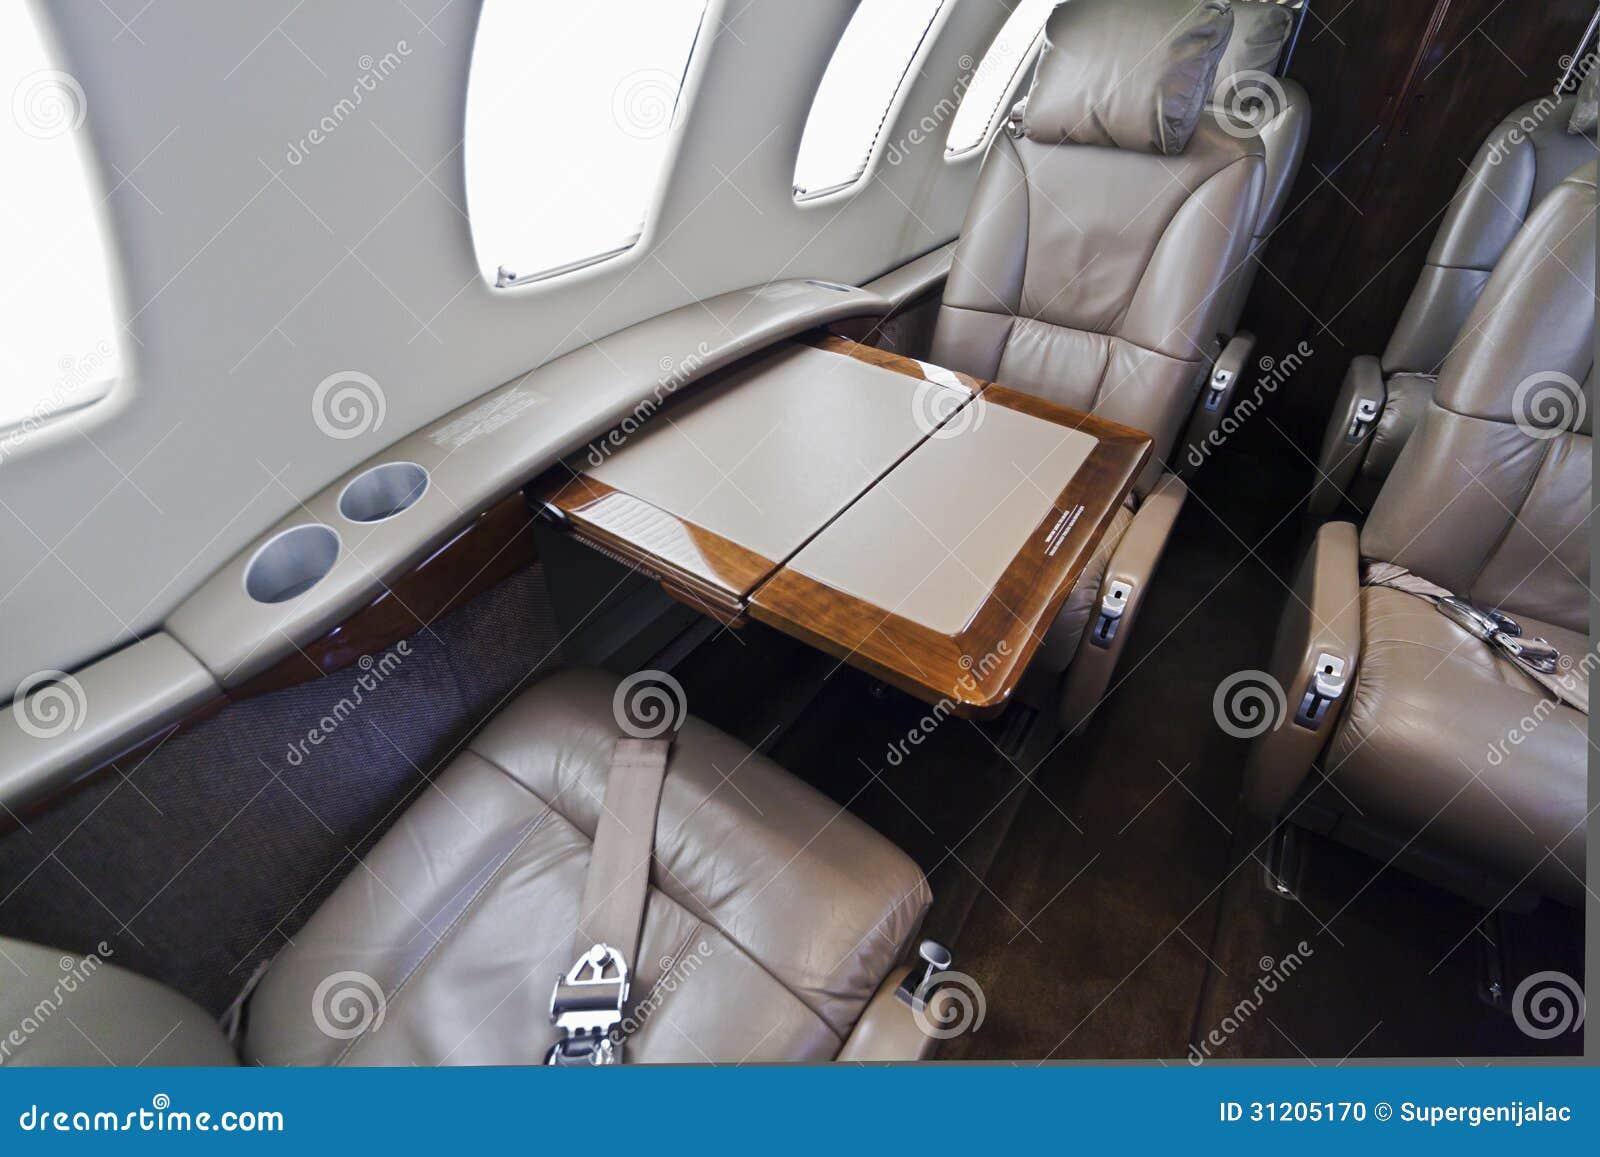 business jet interior stock photo image 31205170. Black Bedroom Furniture Sets. Home Design Ideas